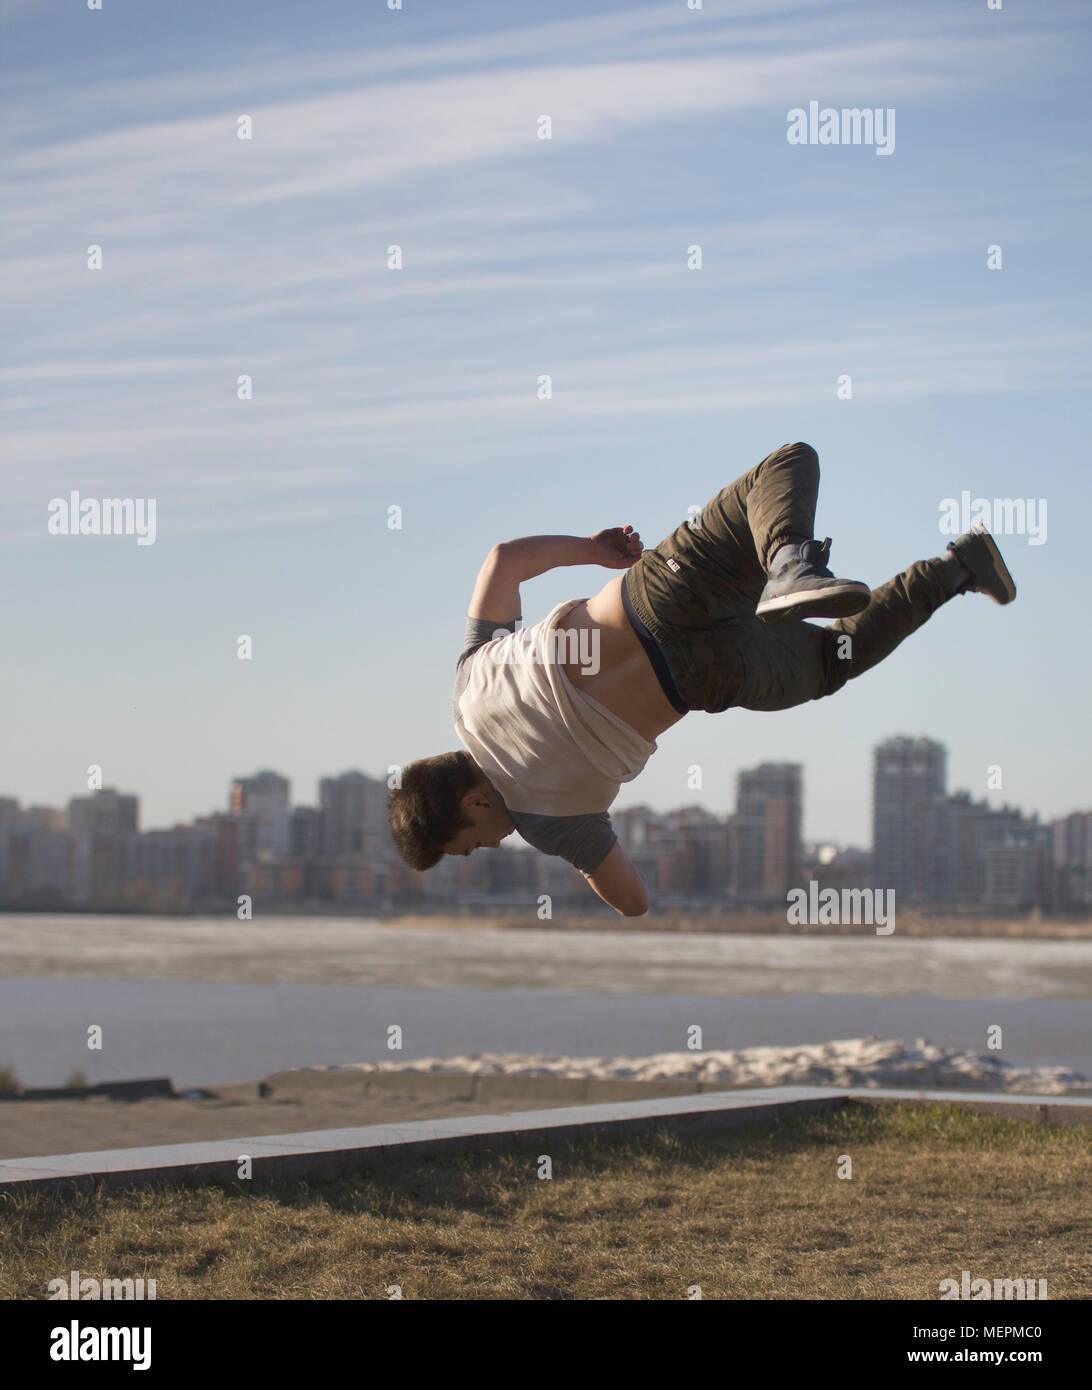 Junger Mann parkour Sportler führt Tricks vor der Skyline Stockbild